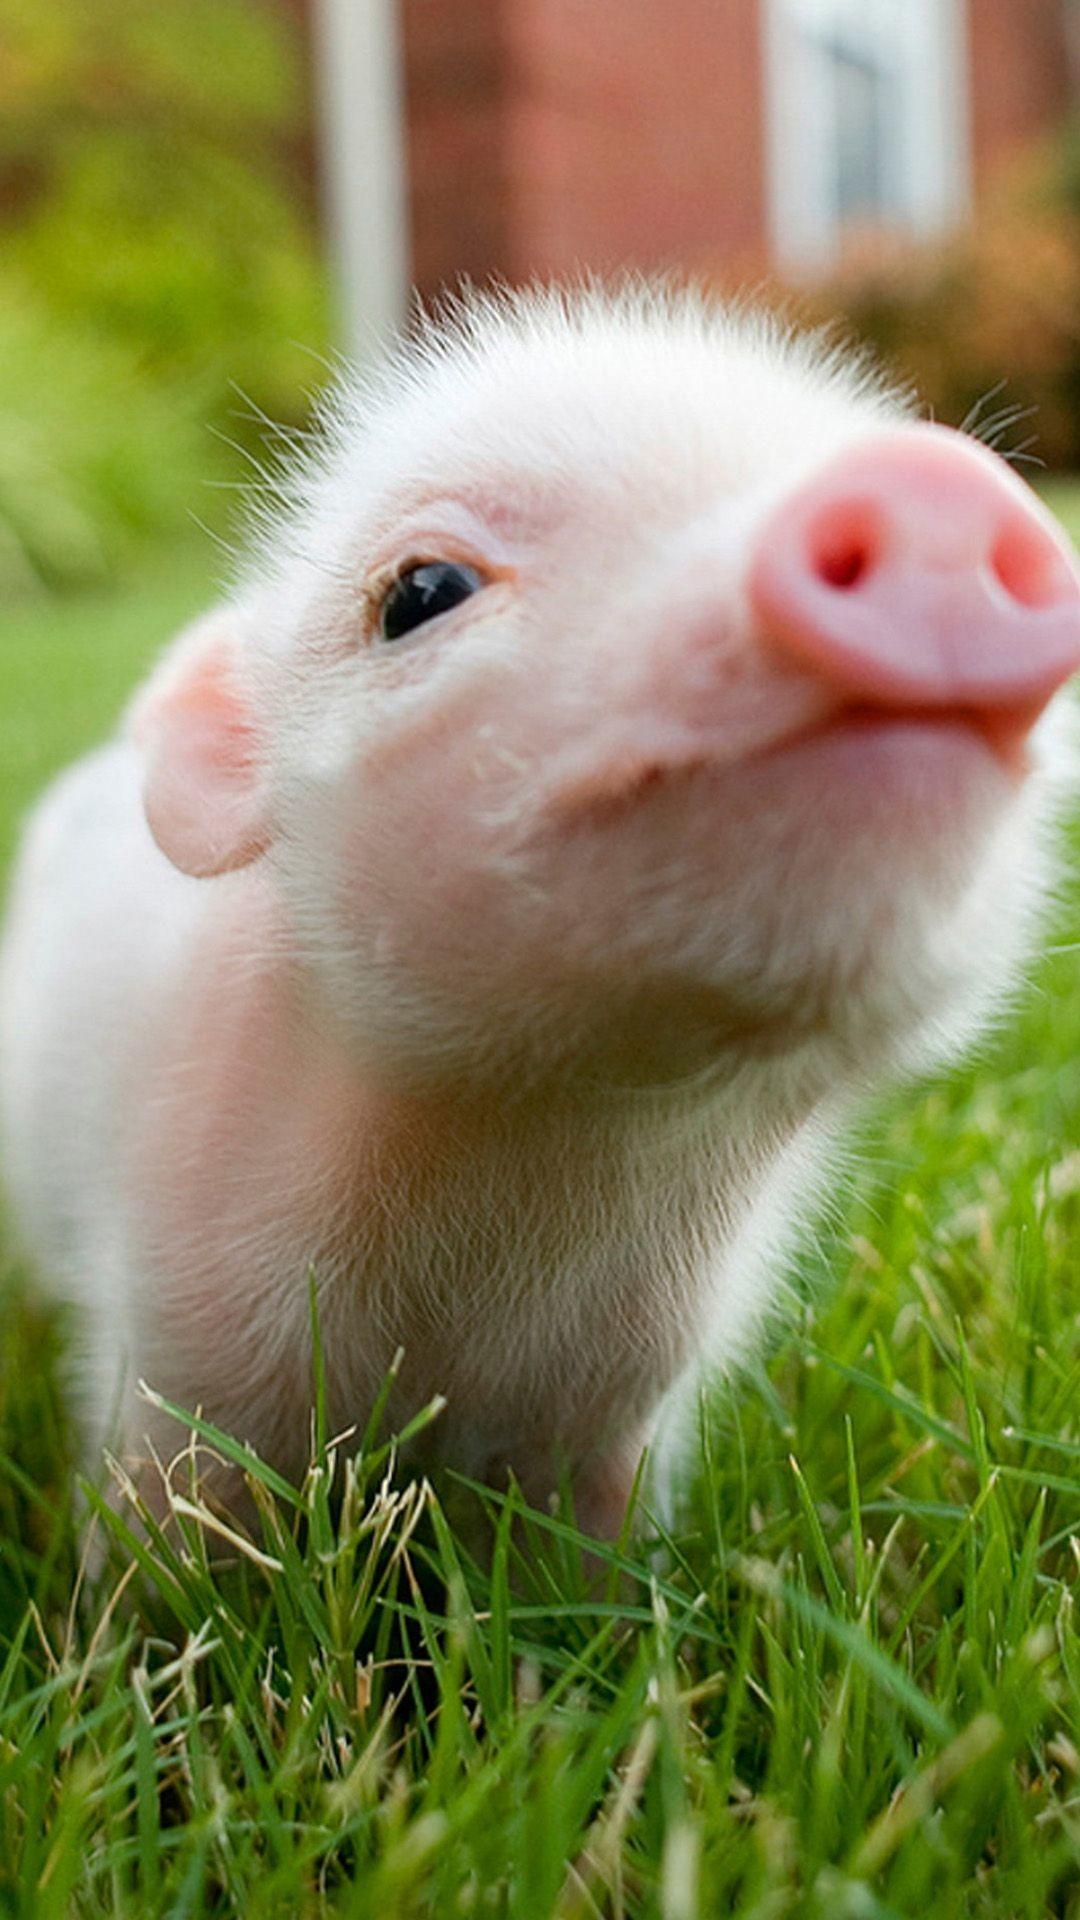 Res: 1080x1920, 17 Best ideas about Pig Wallpaper on Pinterest | Screensaver